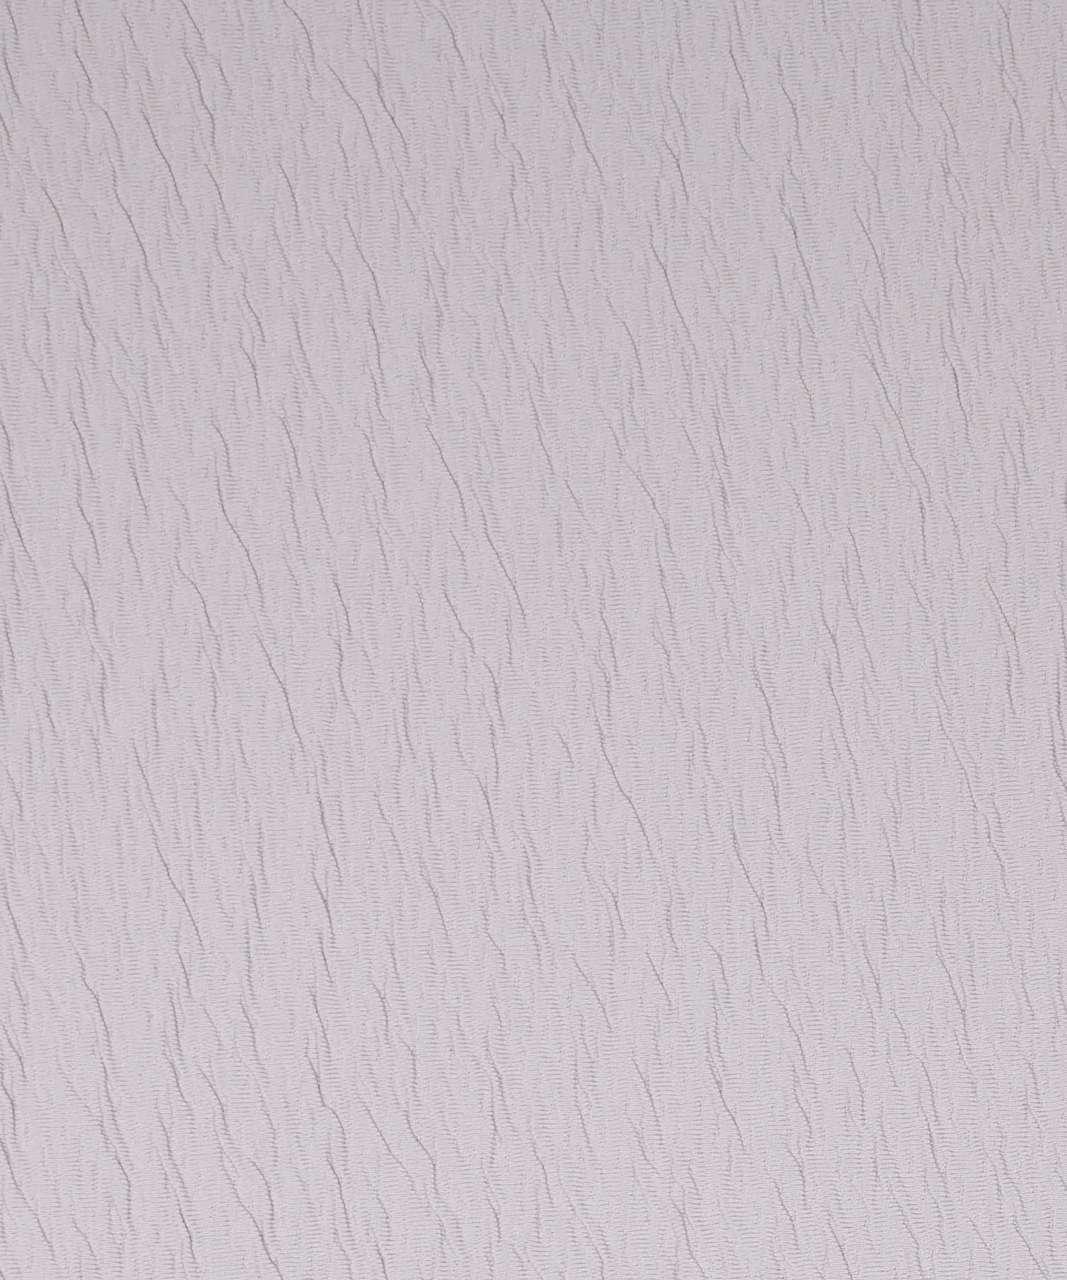 Lululemon Vinyasa Scarf *Crinkle - Silverscreen